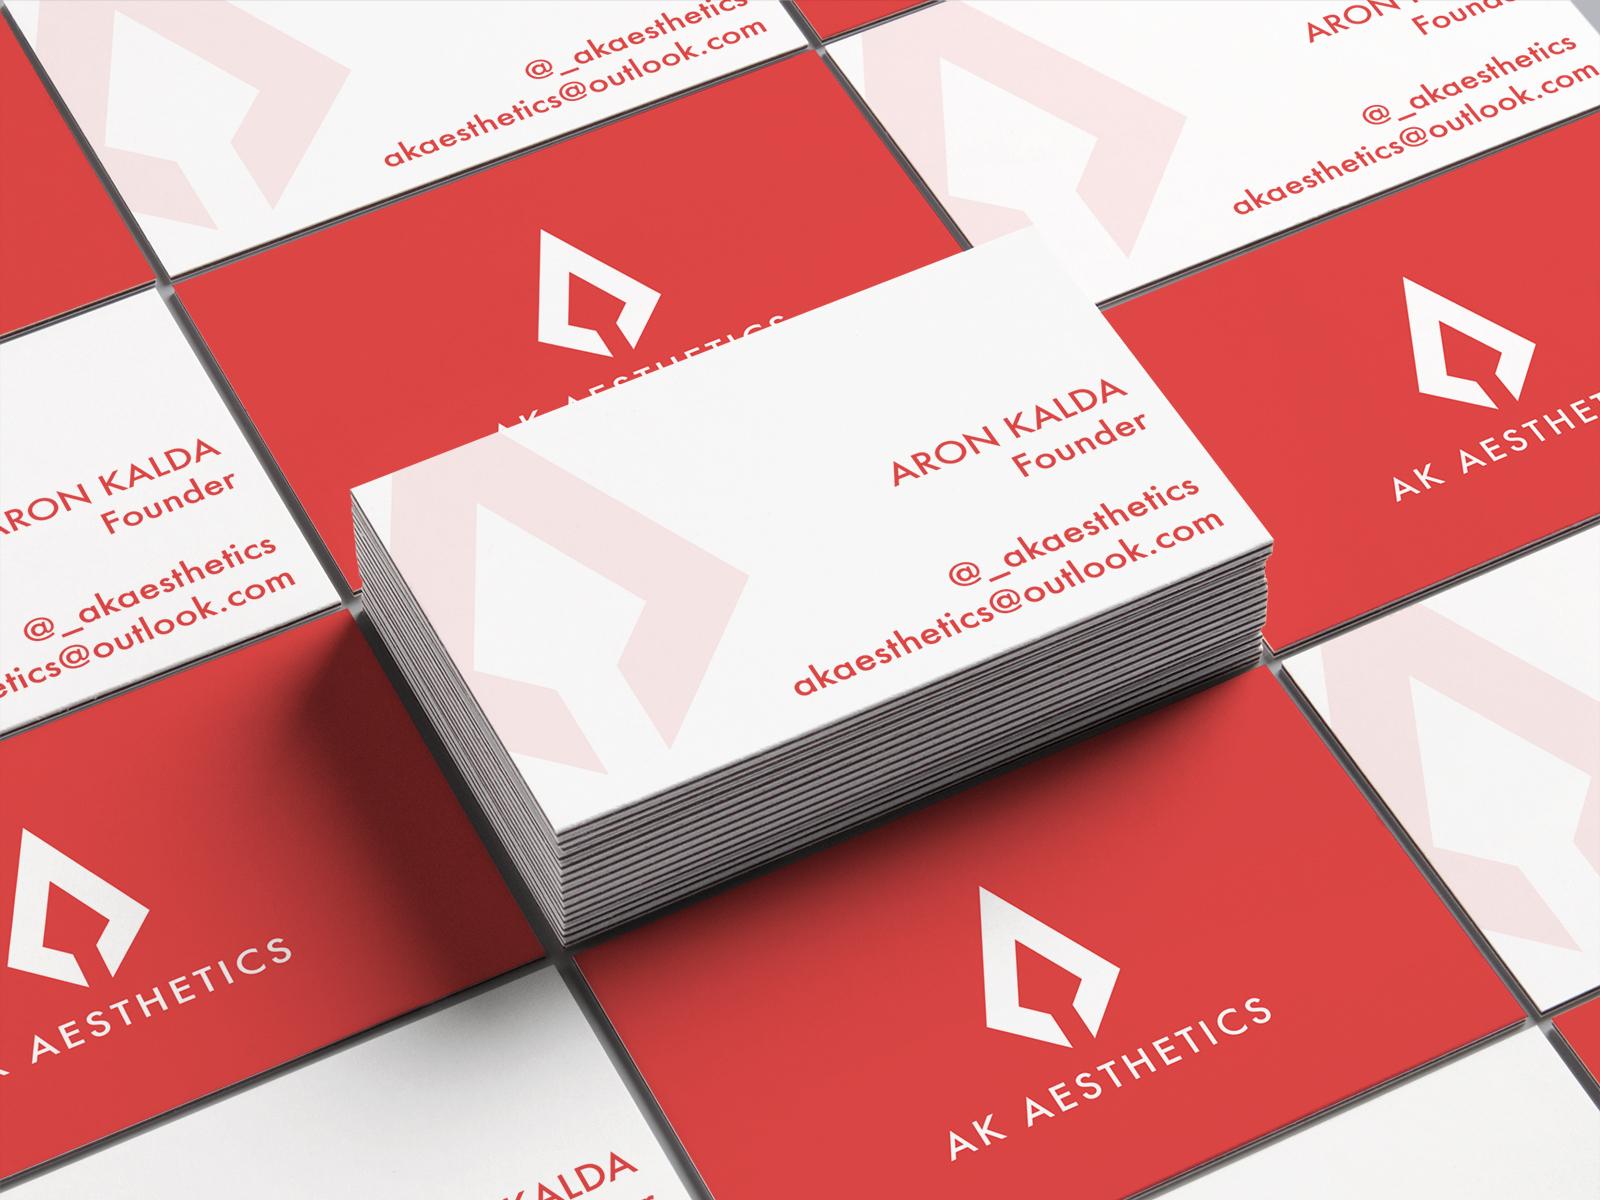 Ak aesthetics   business cards